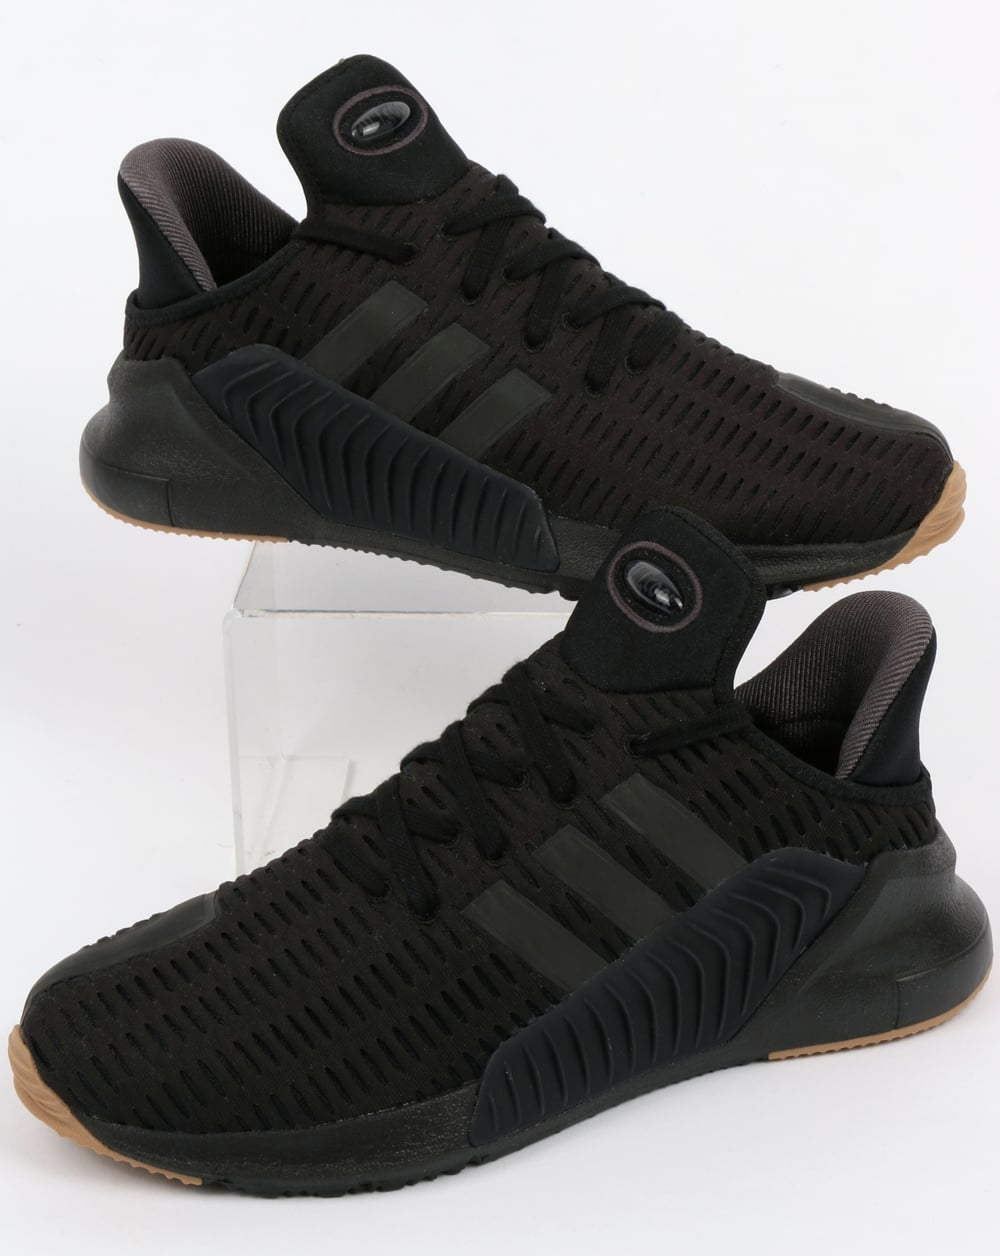 Adidas Climacool 02.17 Trainers Black/Carbon/Gum